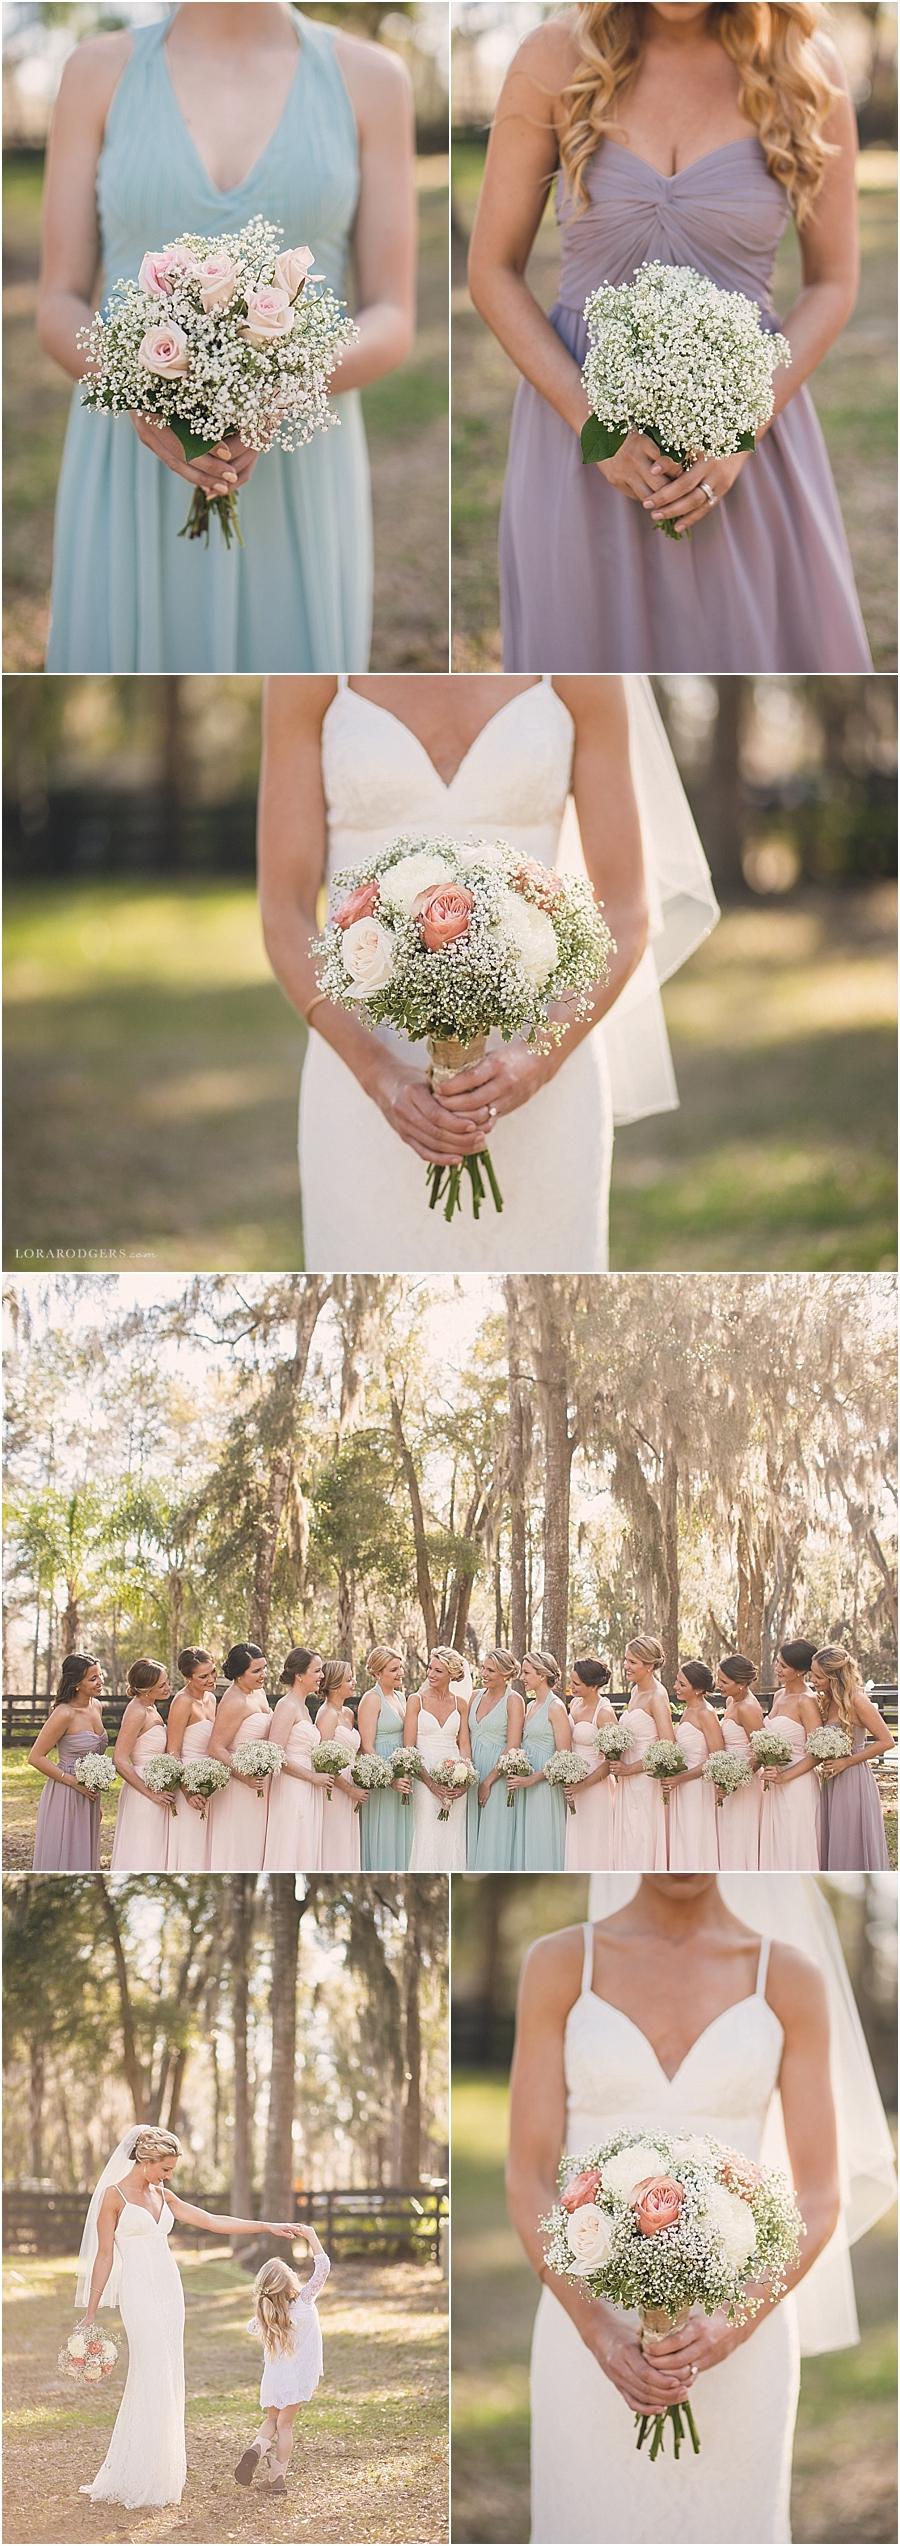 Country_Chic_Ocala_Wedding_021